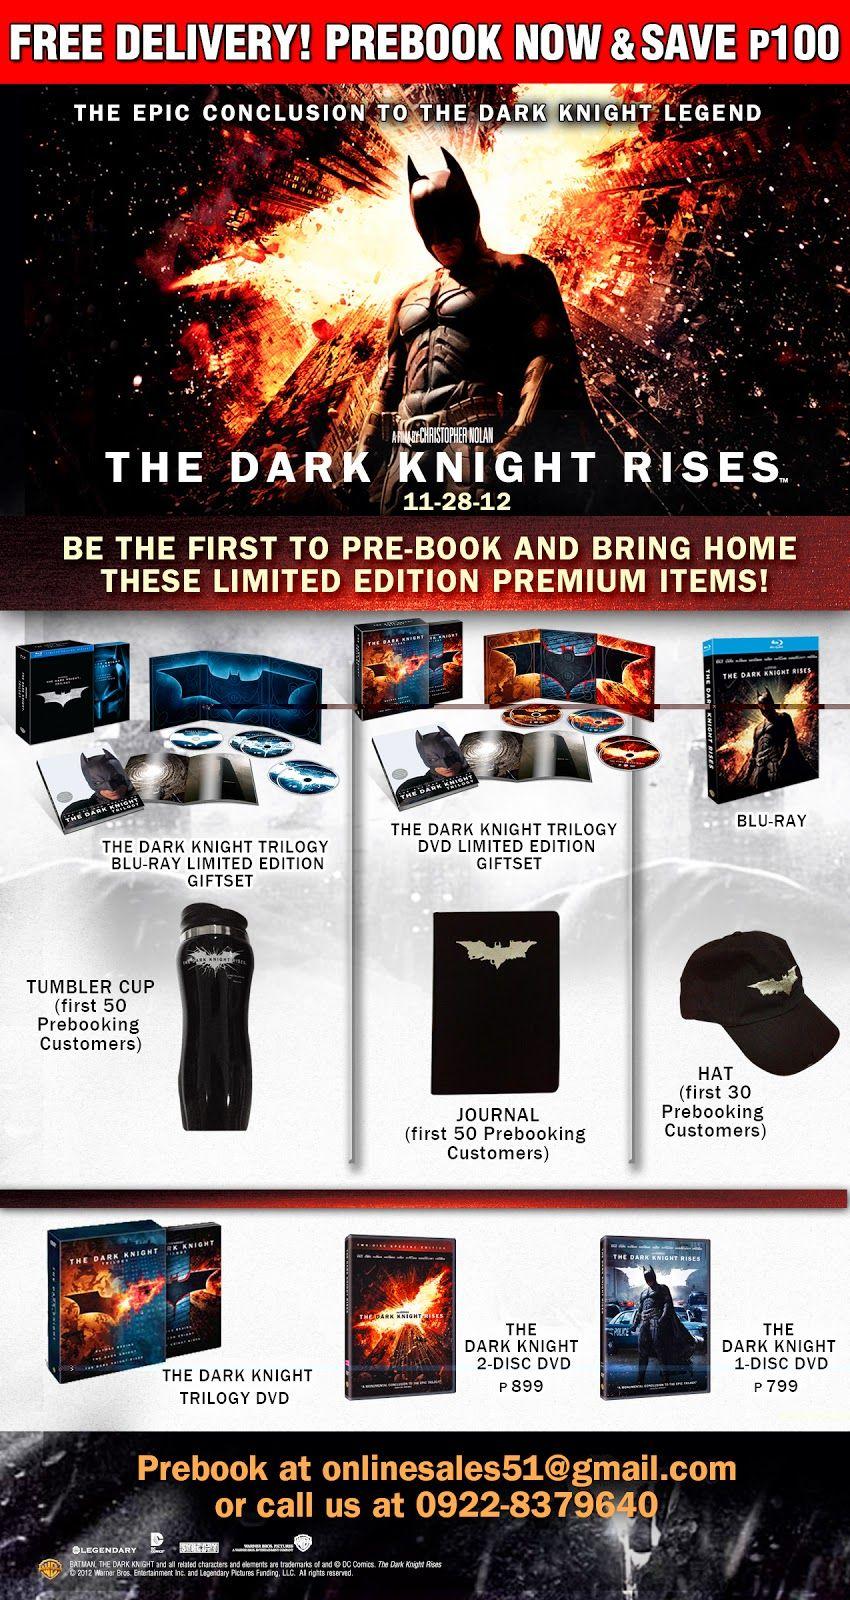 The Dark Knight Rises Blu Ray Details The Dark Knight Rises The